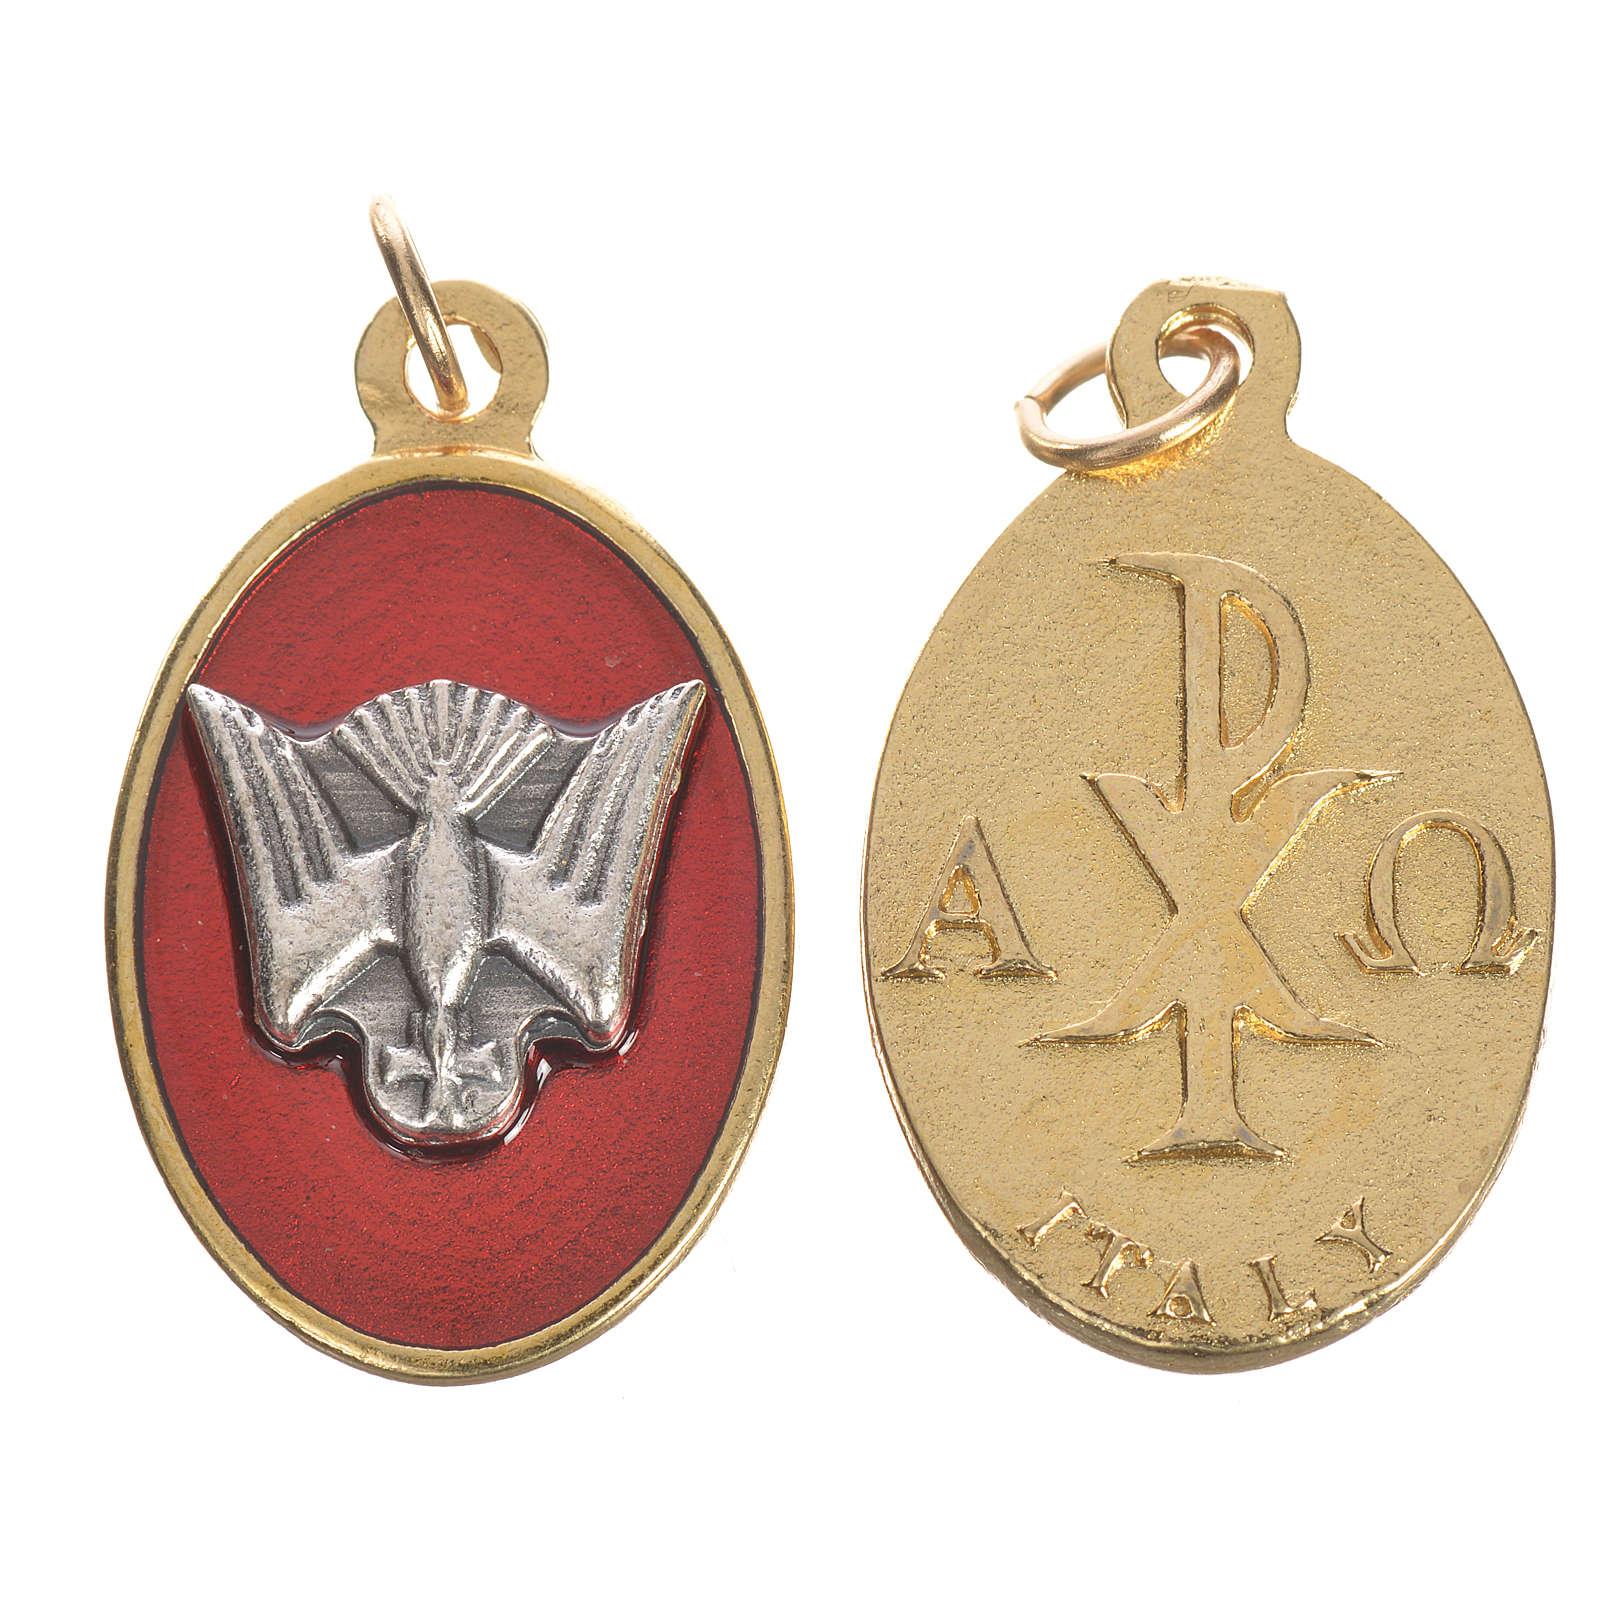 Holy Spirit medal with red enamel, 2.2cm 4